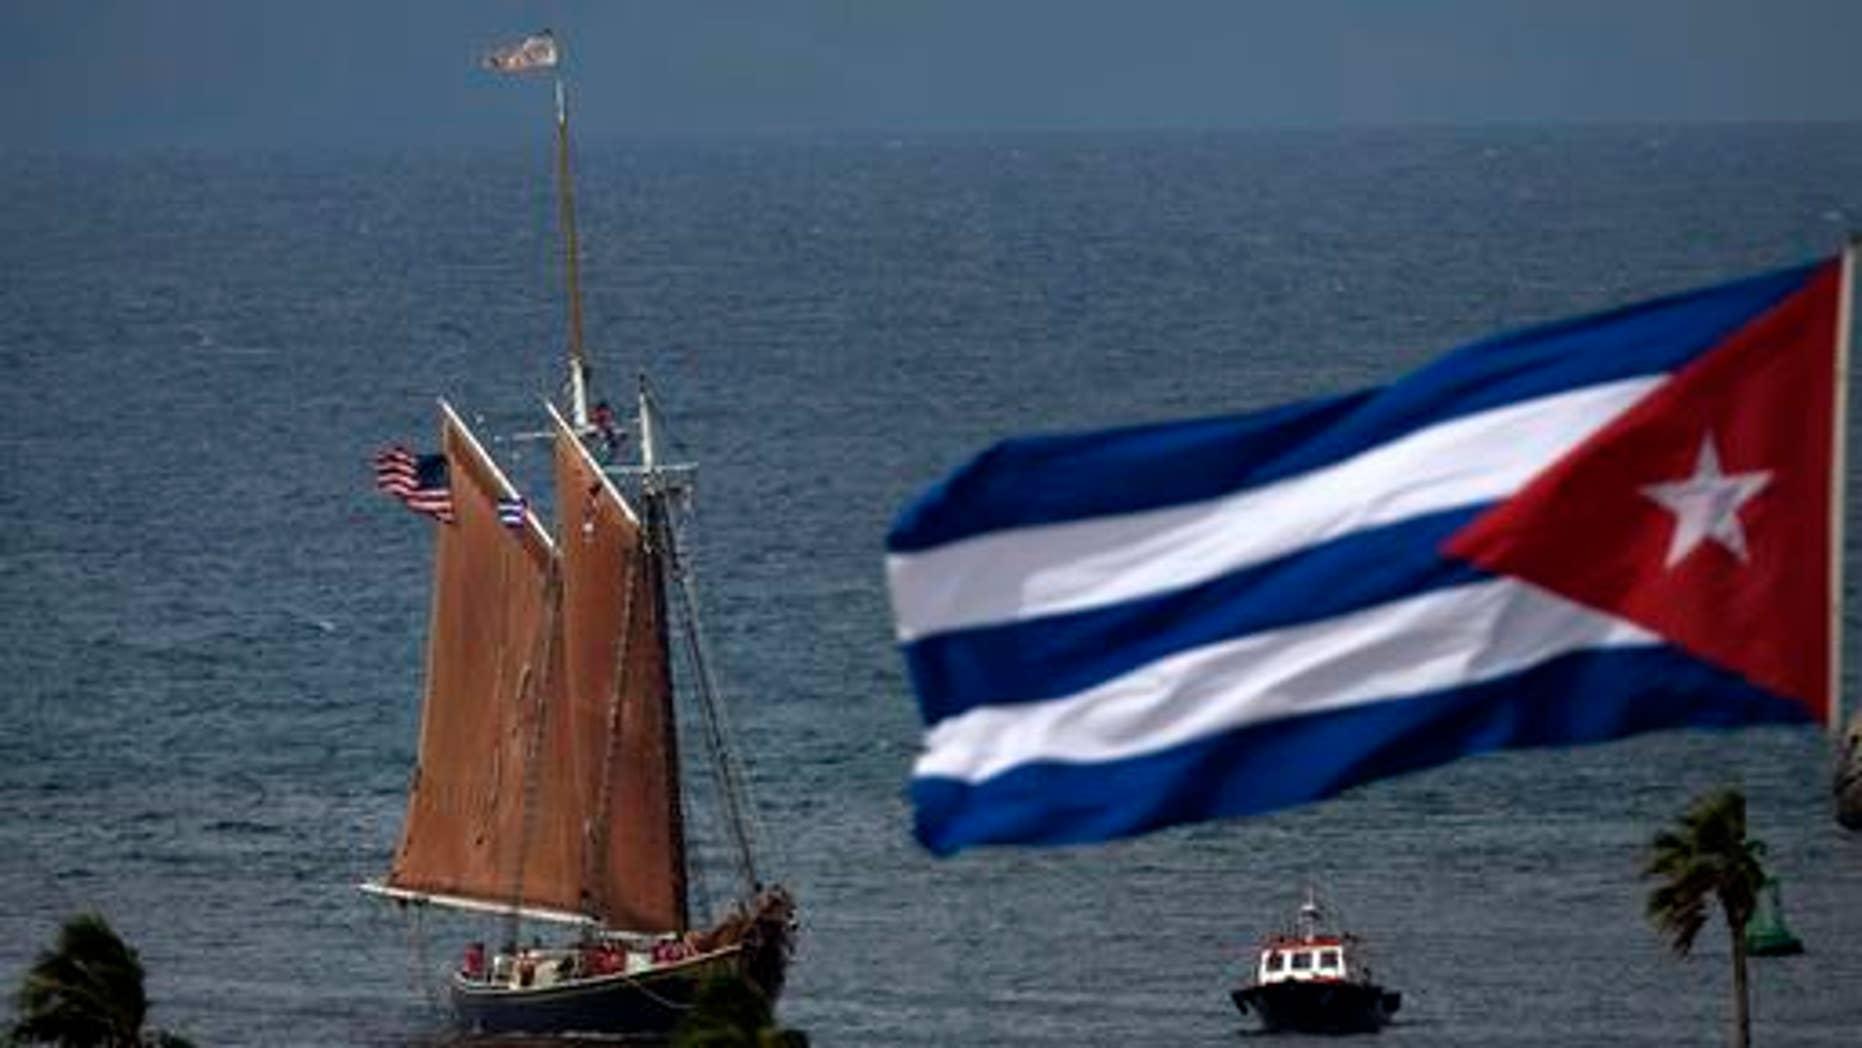 The U.S. tall ship Roseway arrives to Havana's harbor carrying 22 American high school students for a semester-at-sea program World Ocean School, in Havana, Cuba, Tuesday, Oct. 25, 2016. (AP Photo/Ramon Espinosa)